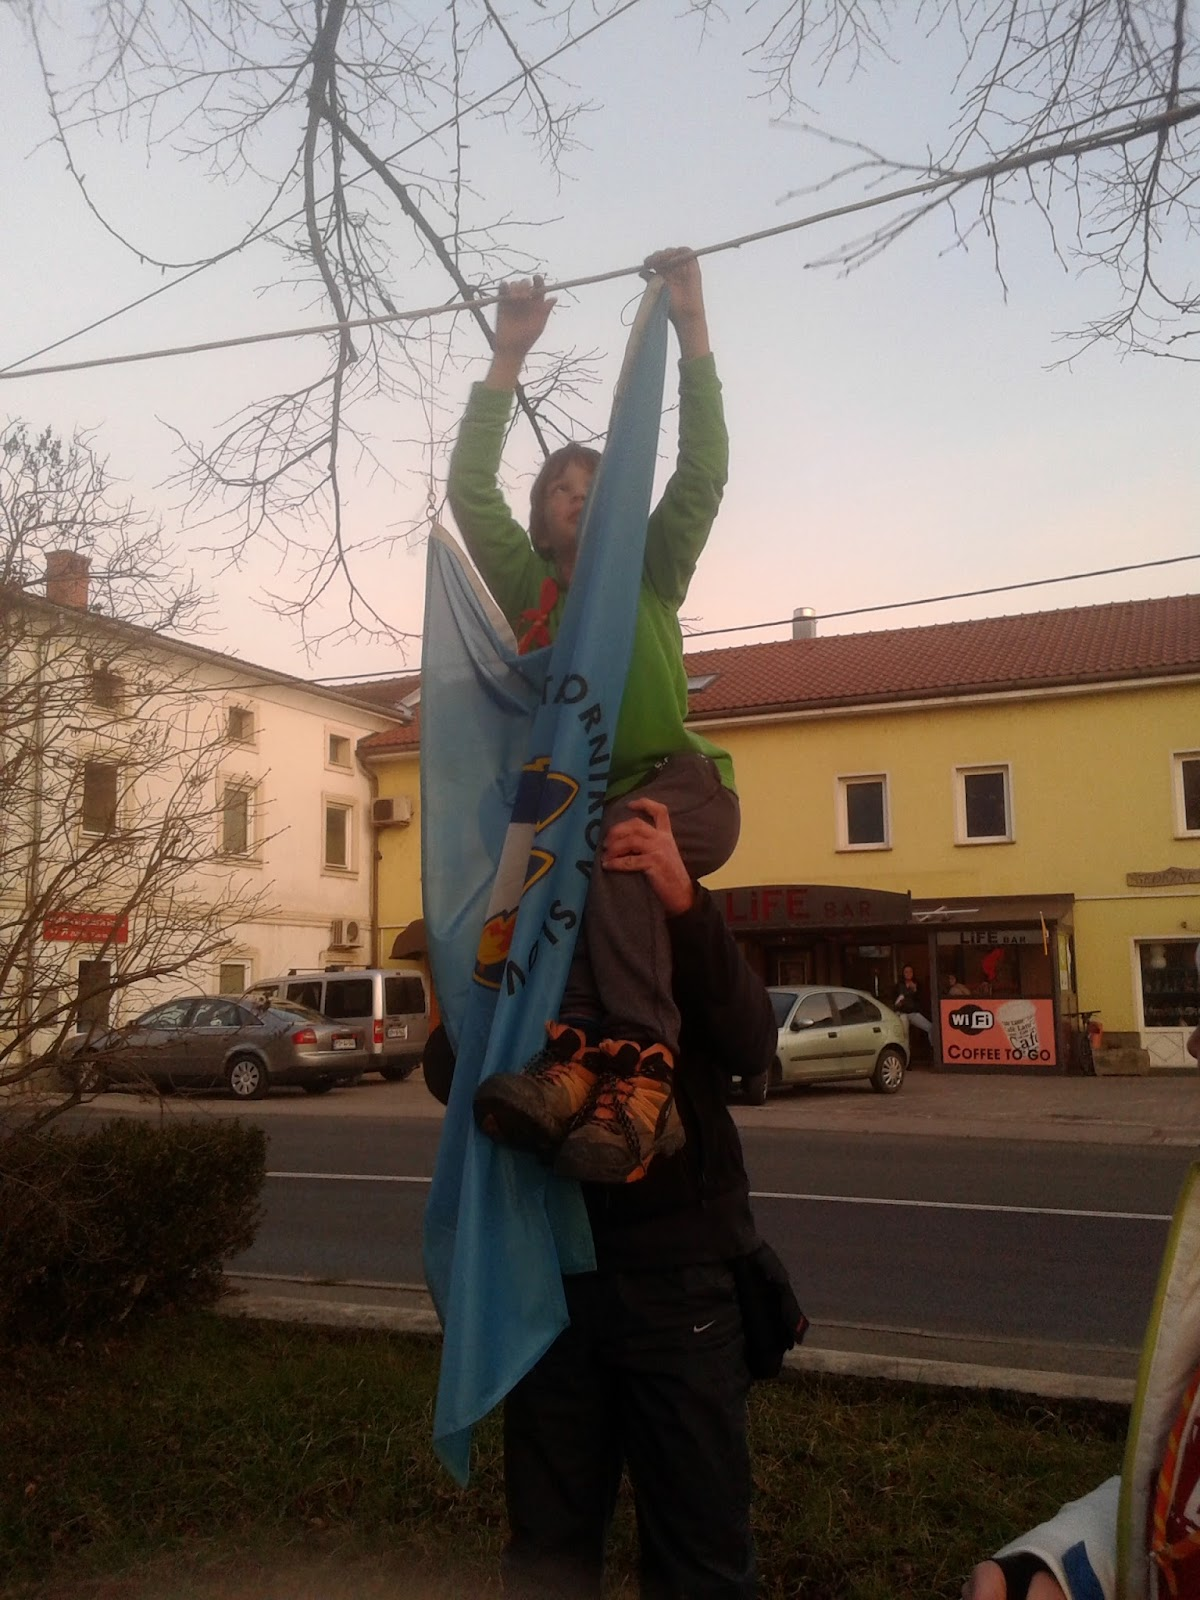 MČ pekarija, Ilirska Bistrica, 10. in 12. december - 20151212_162007.jpg